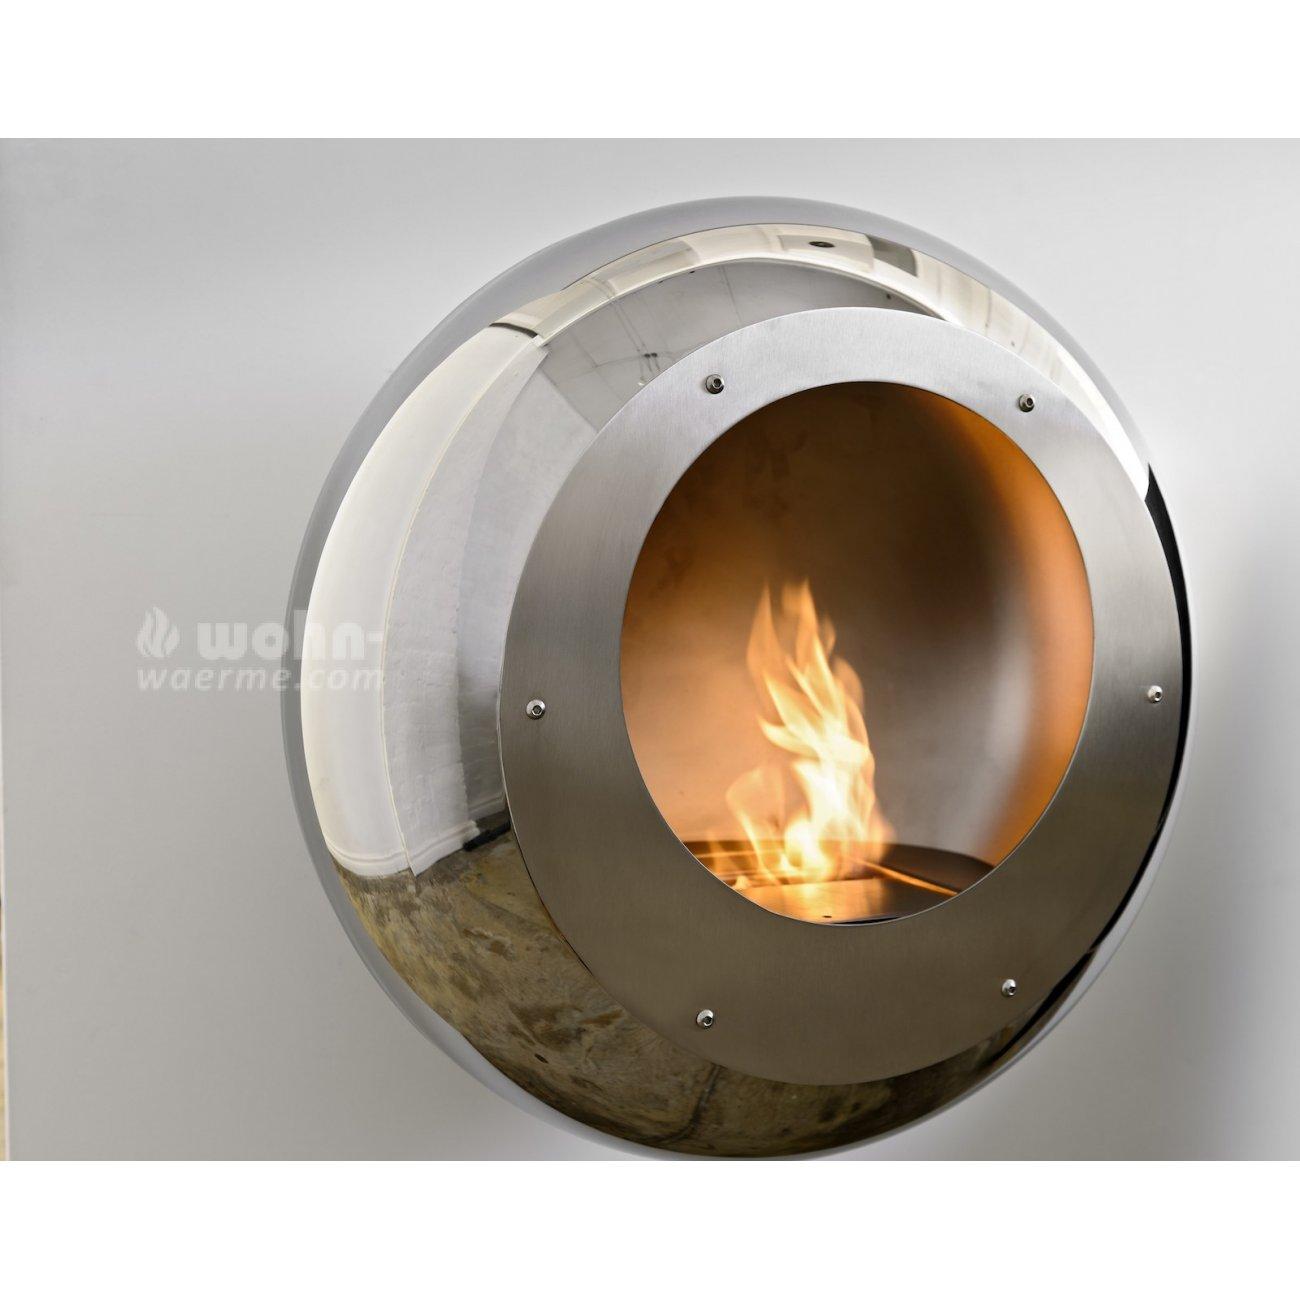 cocoon fires vellum design ethanolkamin f r die wand. Black Bedroom Furniture Sets. Home Design Ideas